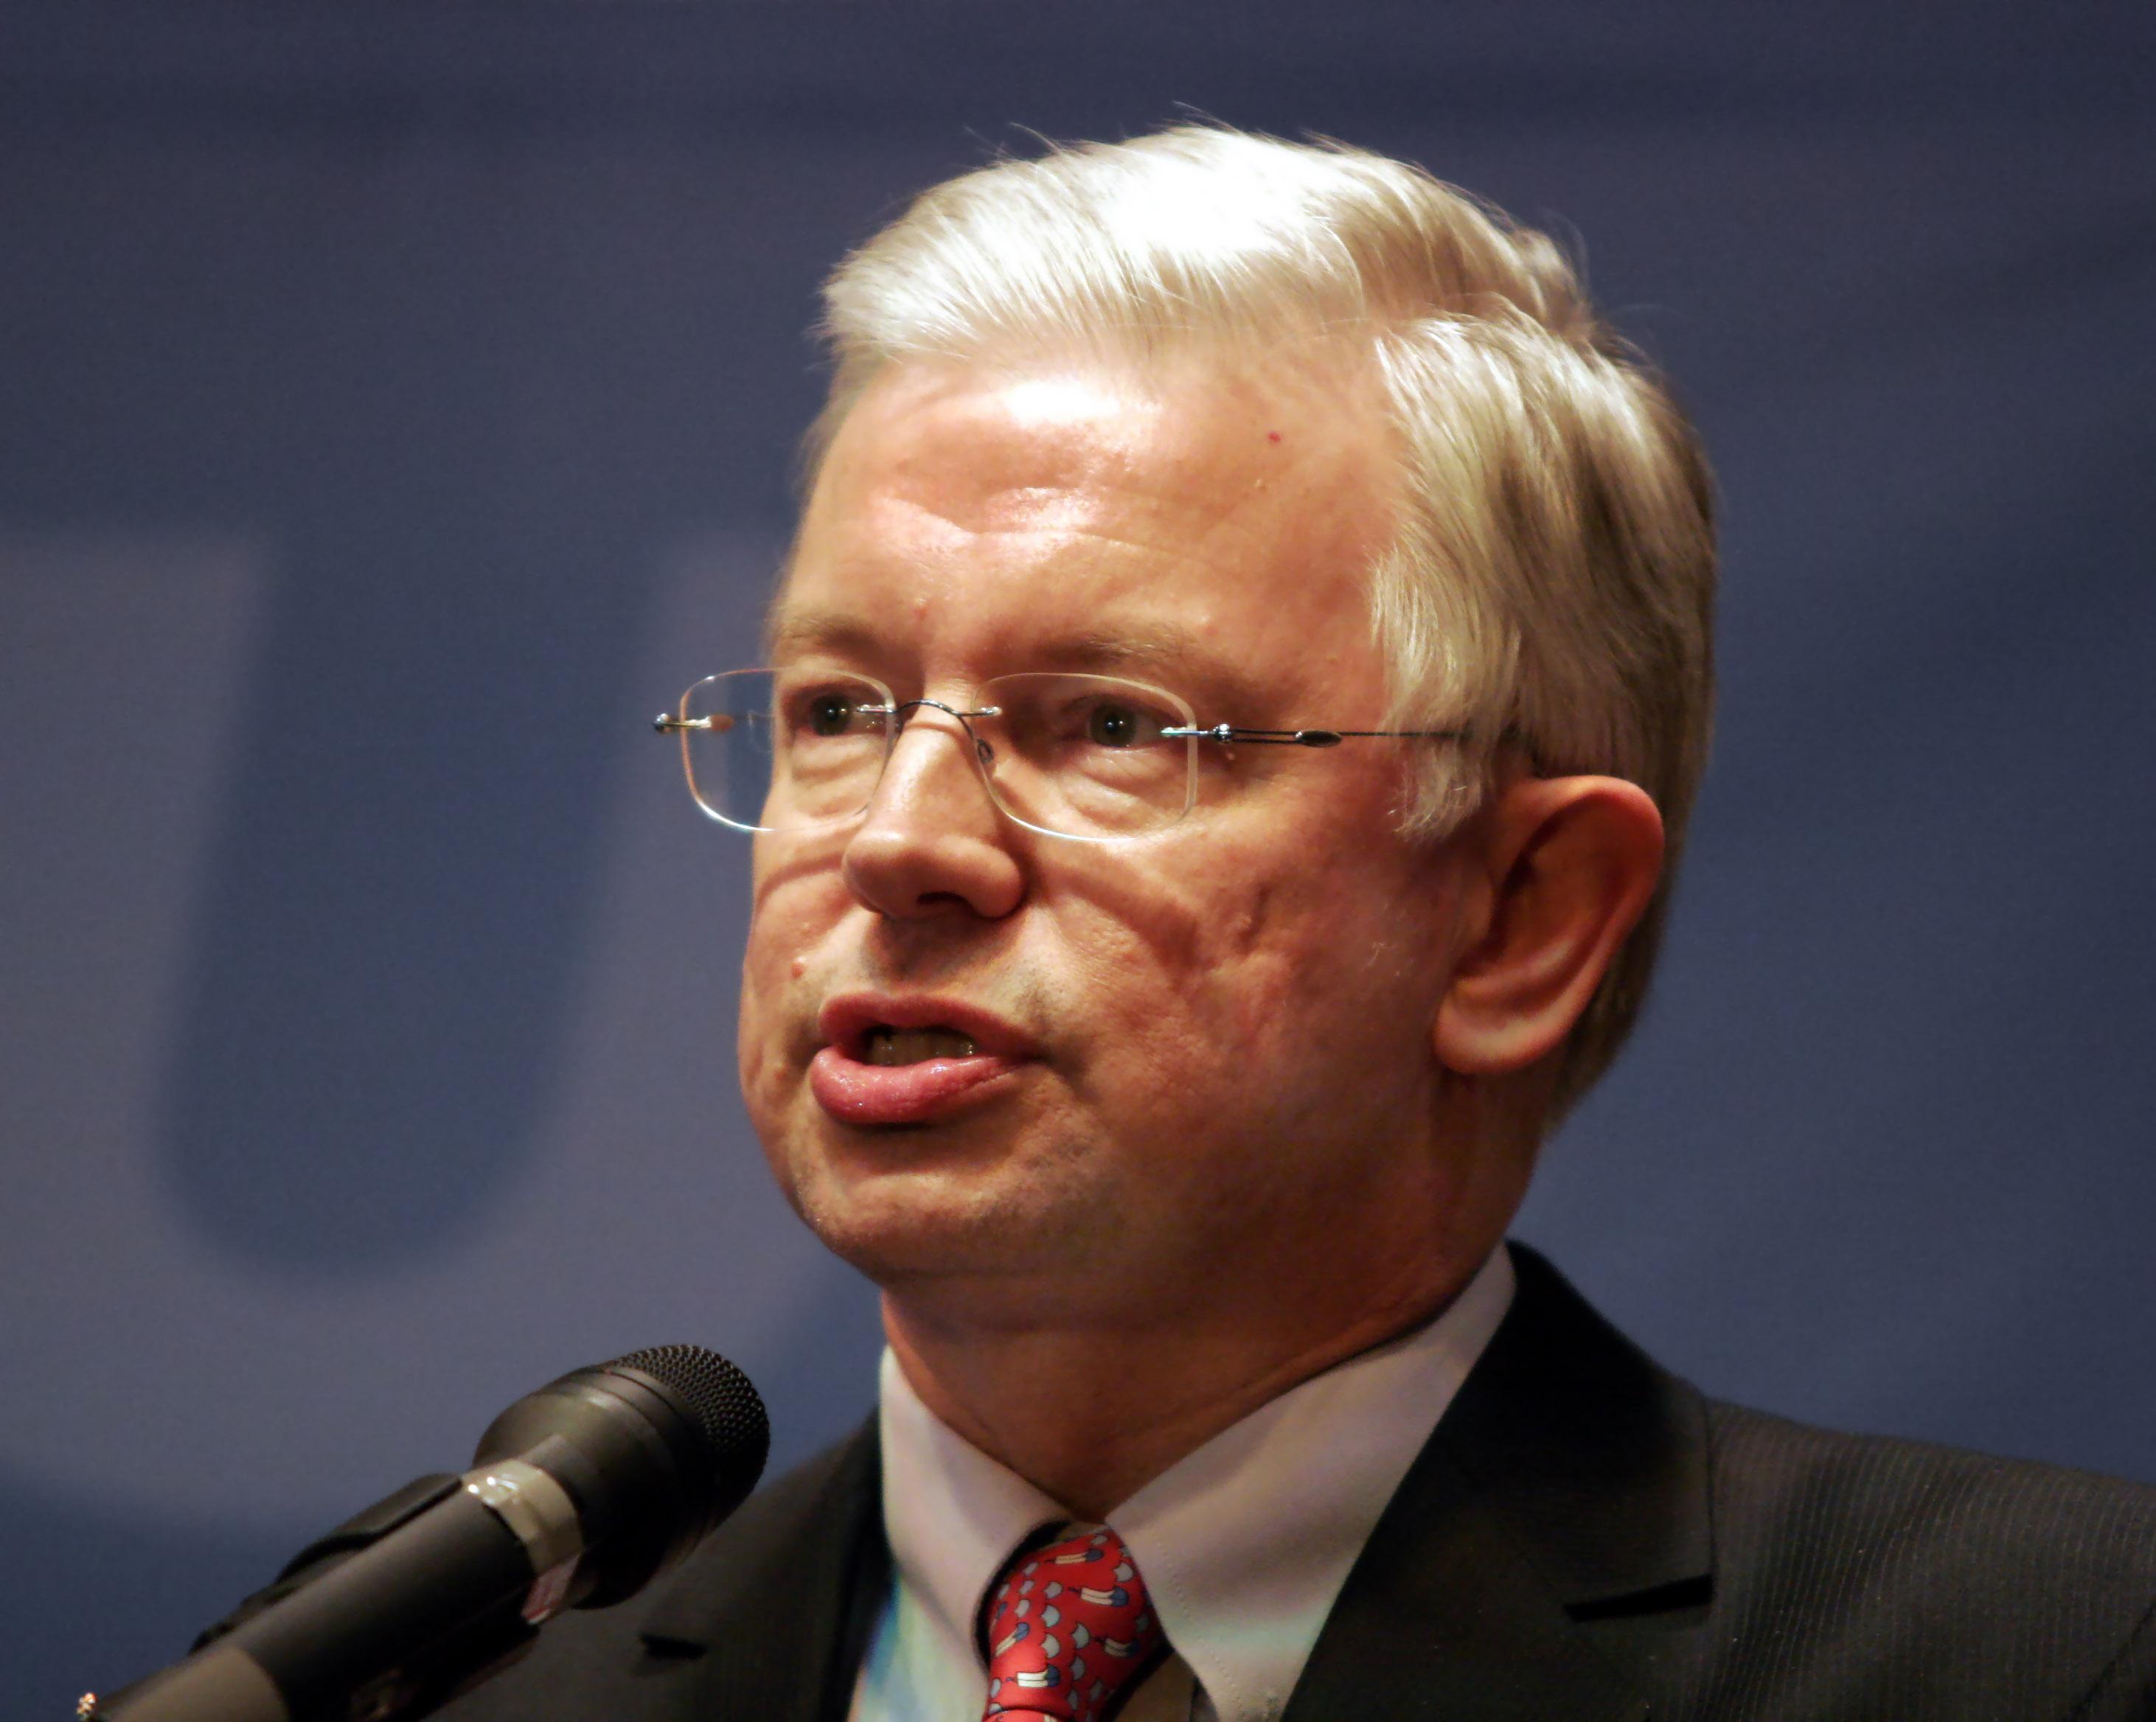 Roland koch steckbrief promi for Koch politiker